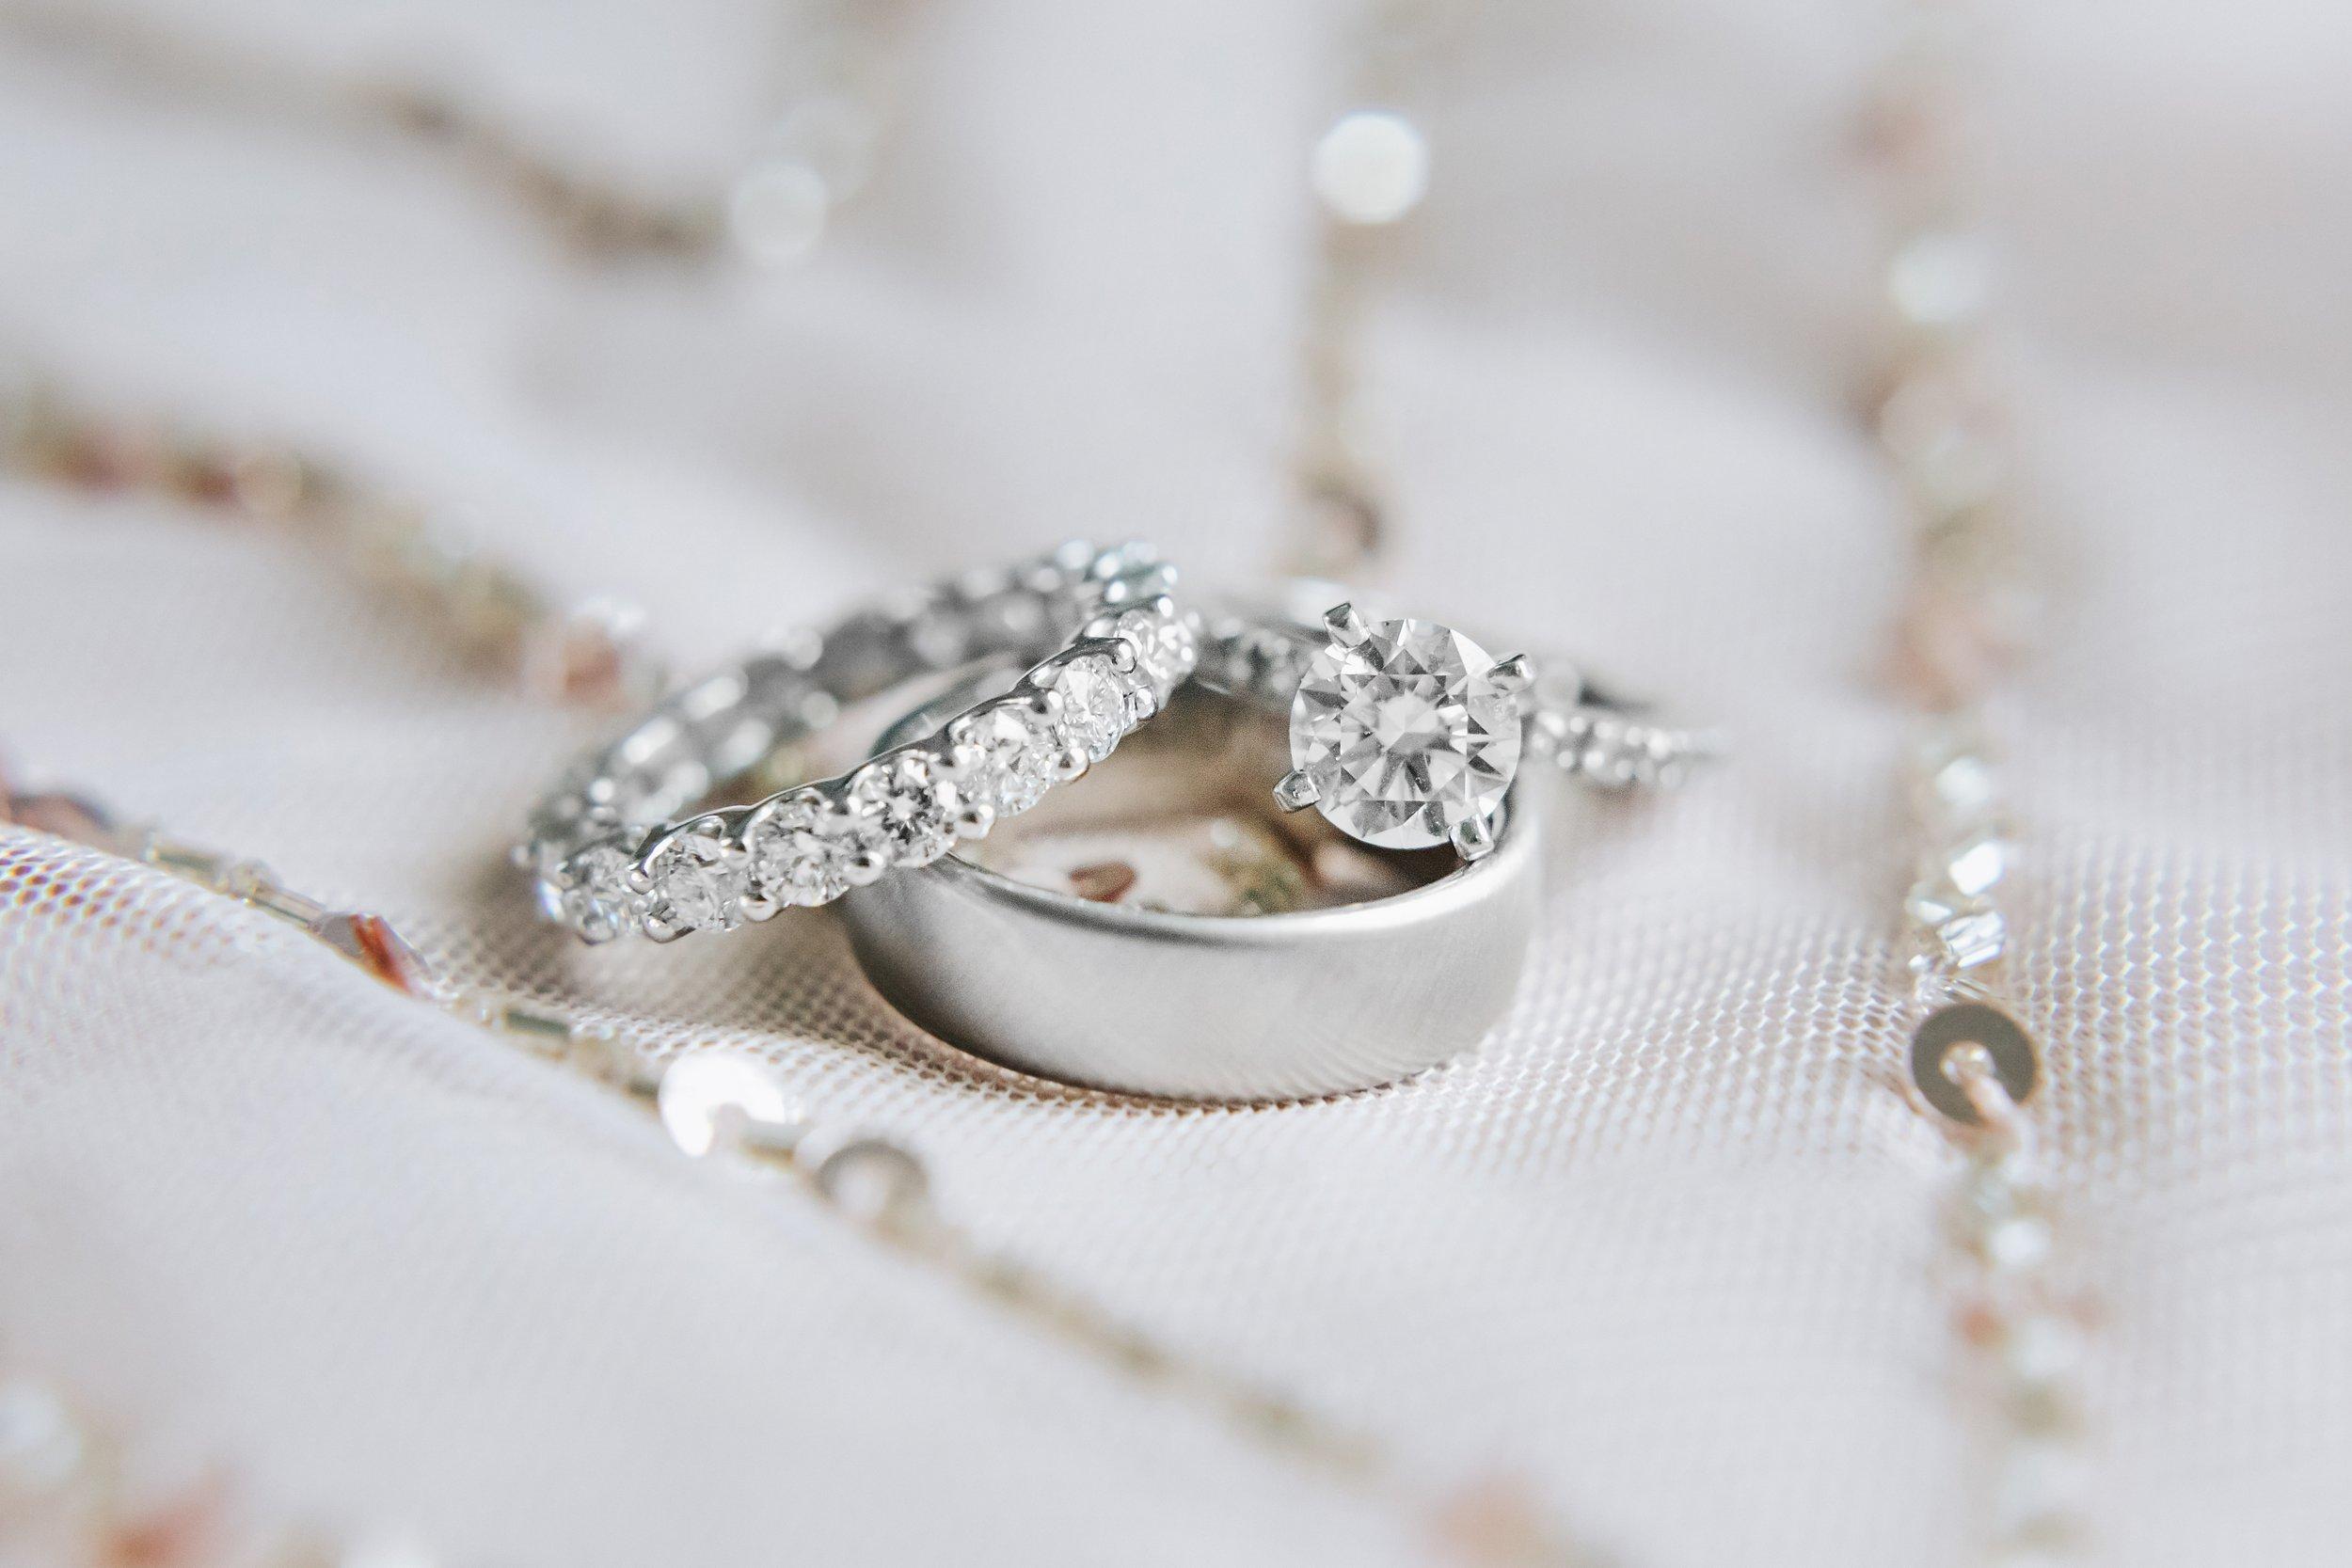 Popponesset-Inn-Wedding-Cape-Cod-Lena-Mirisola-Photography-4.jpg